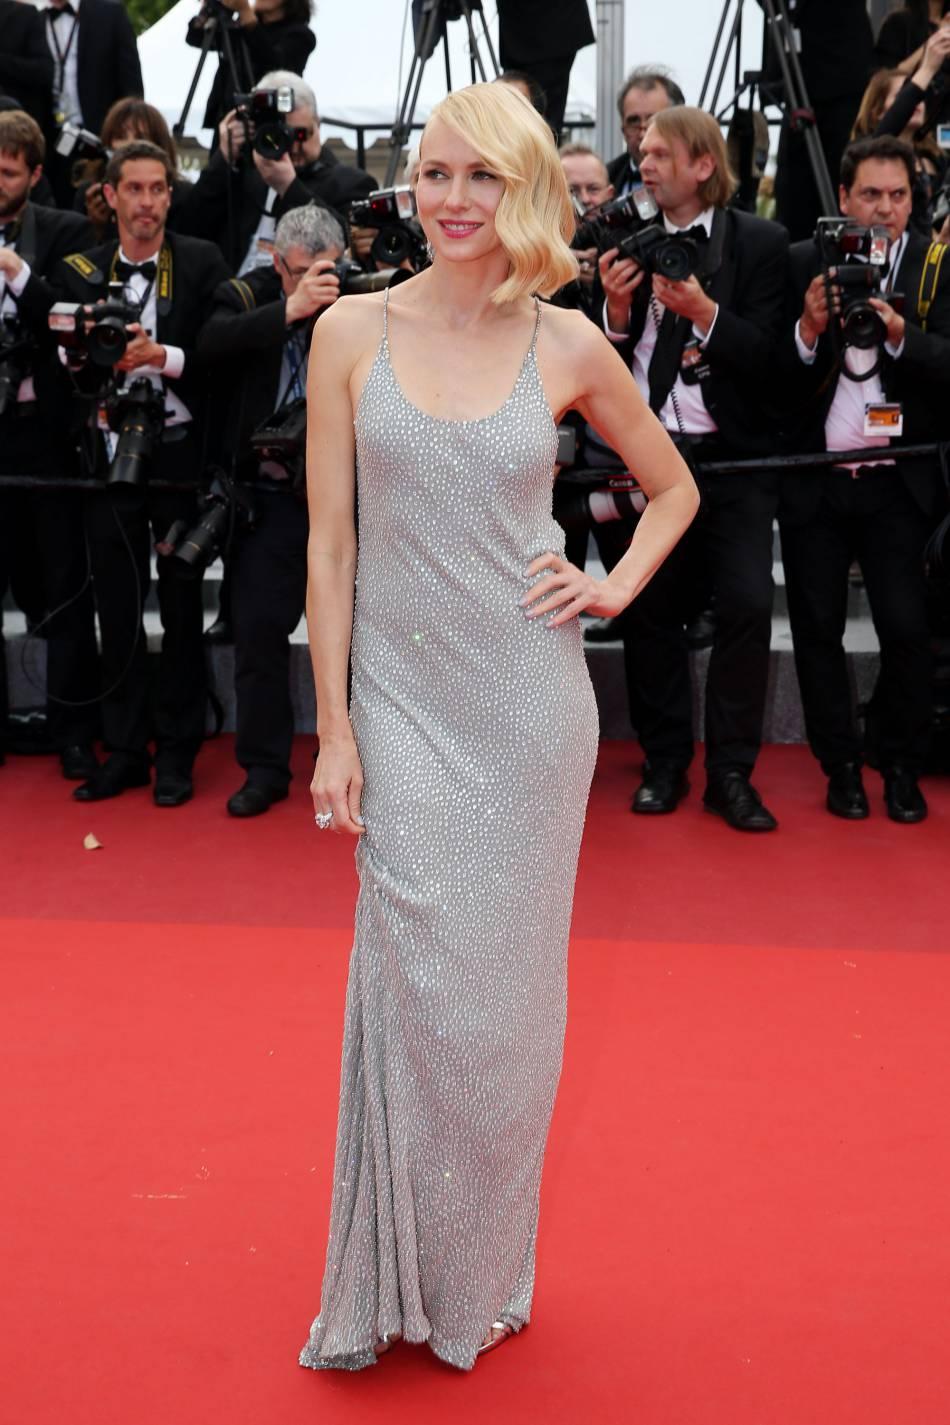 Naomi Watts sublime sa silhouette dans cette robe Michael Kors scintillante.